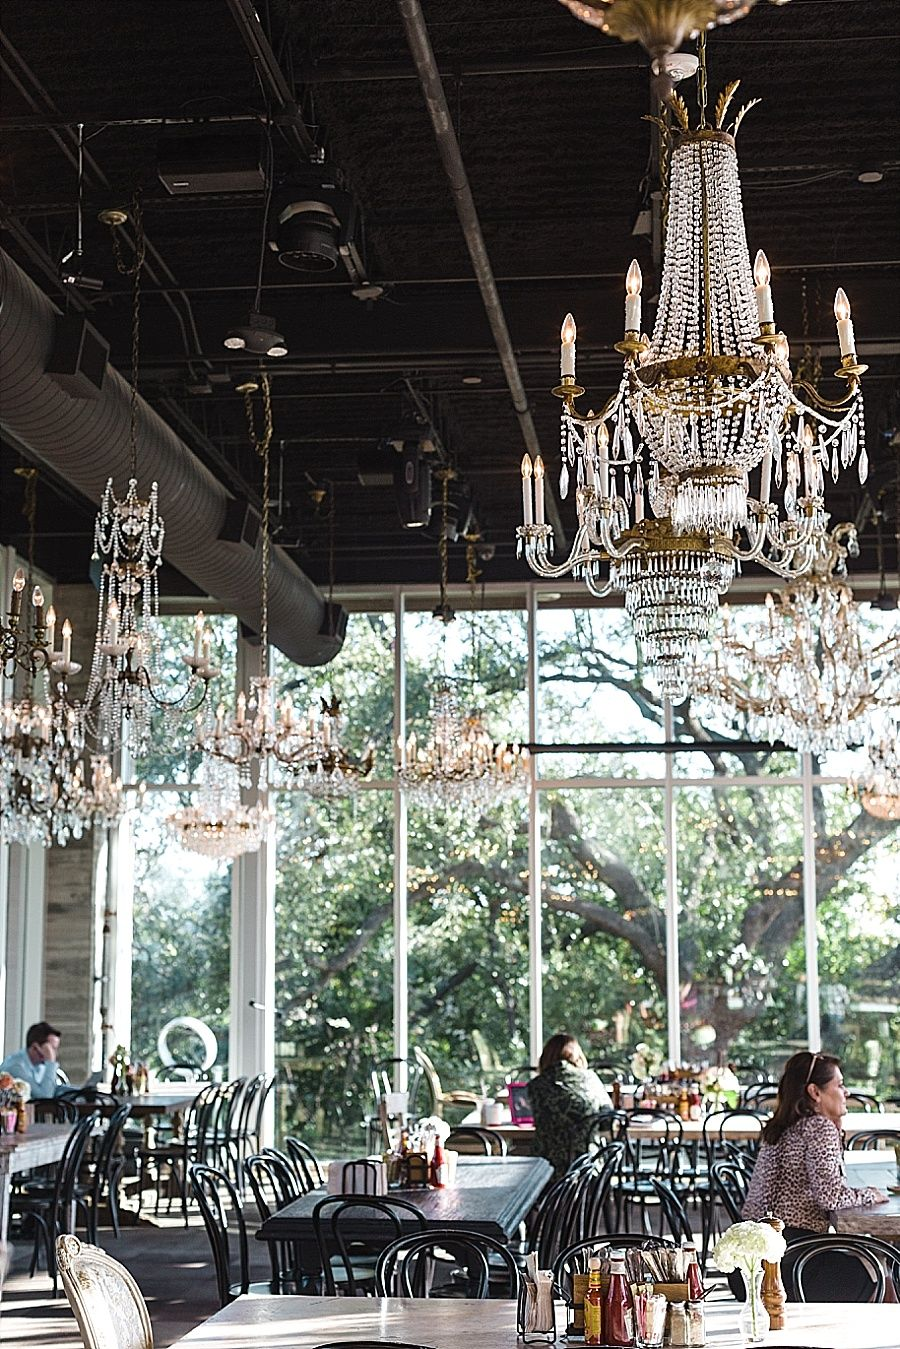 Wooded Elegance The Kitchen At The Dunlavy Luxury Restaurant Houston Brunch Houston Travel